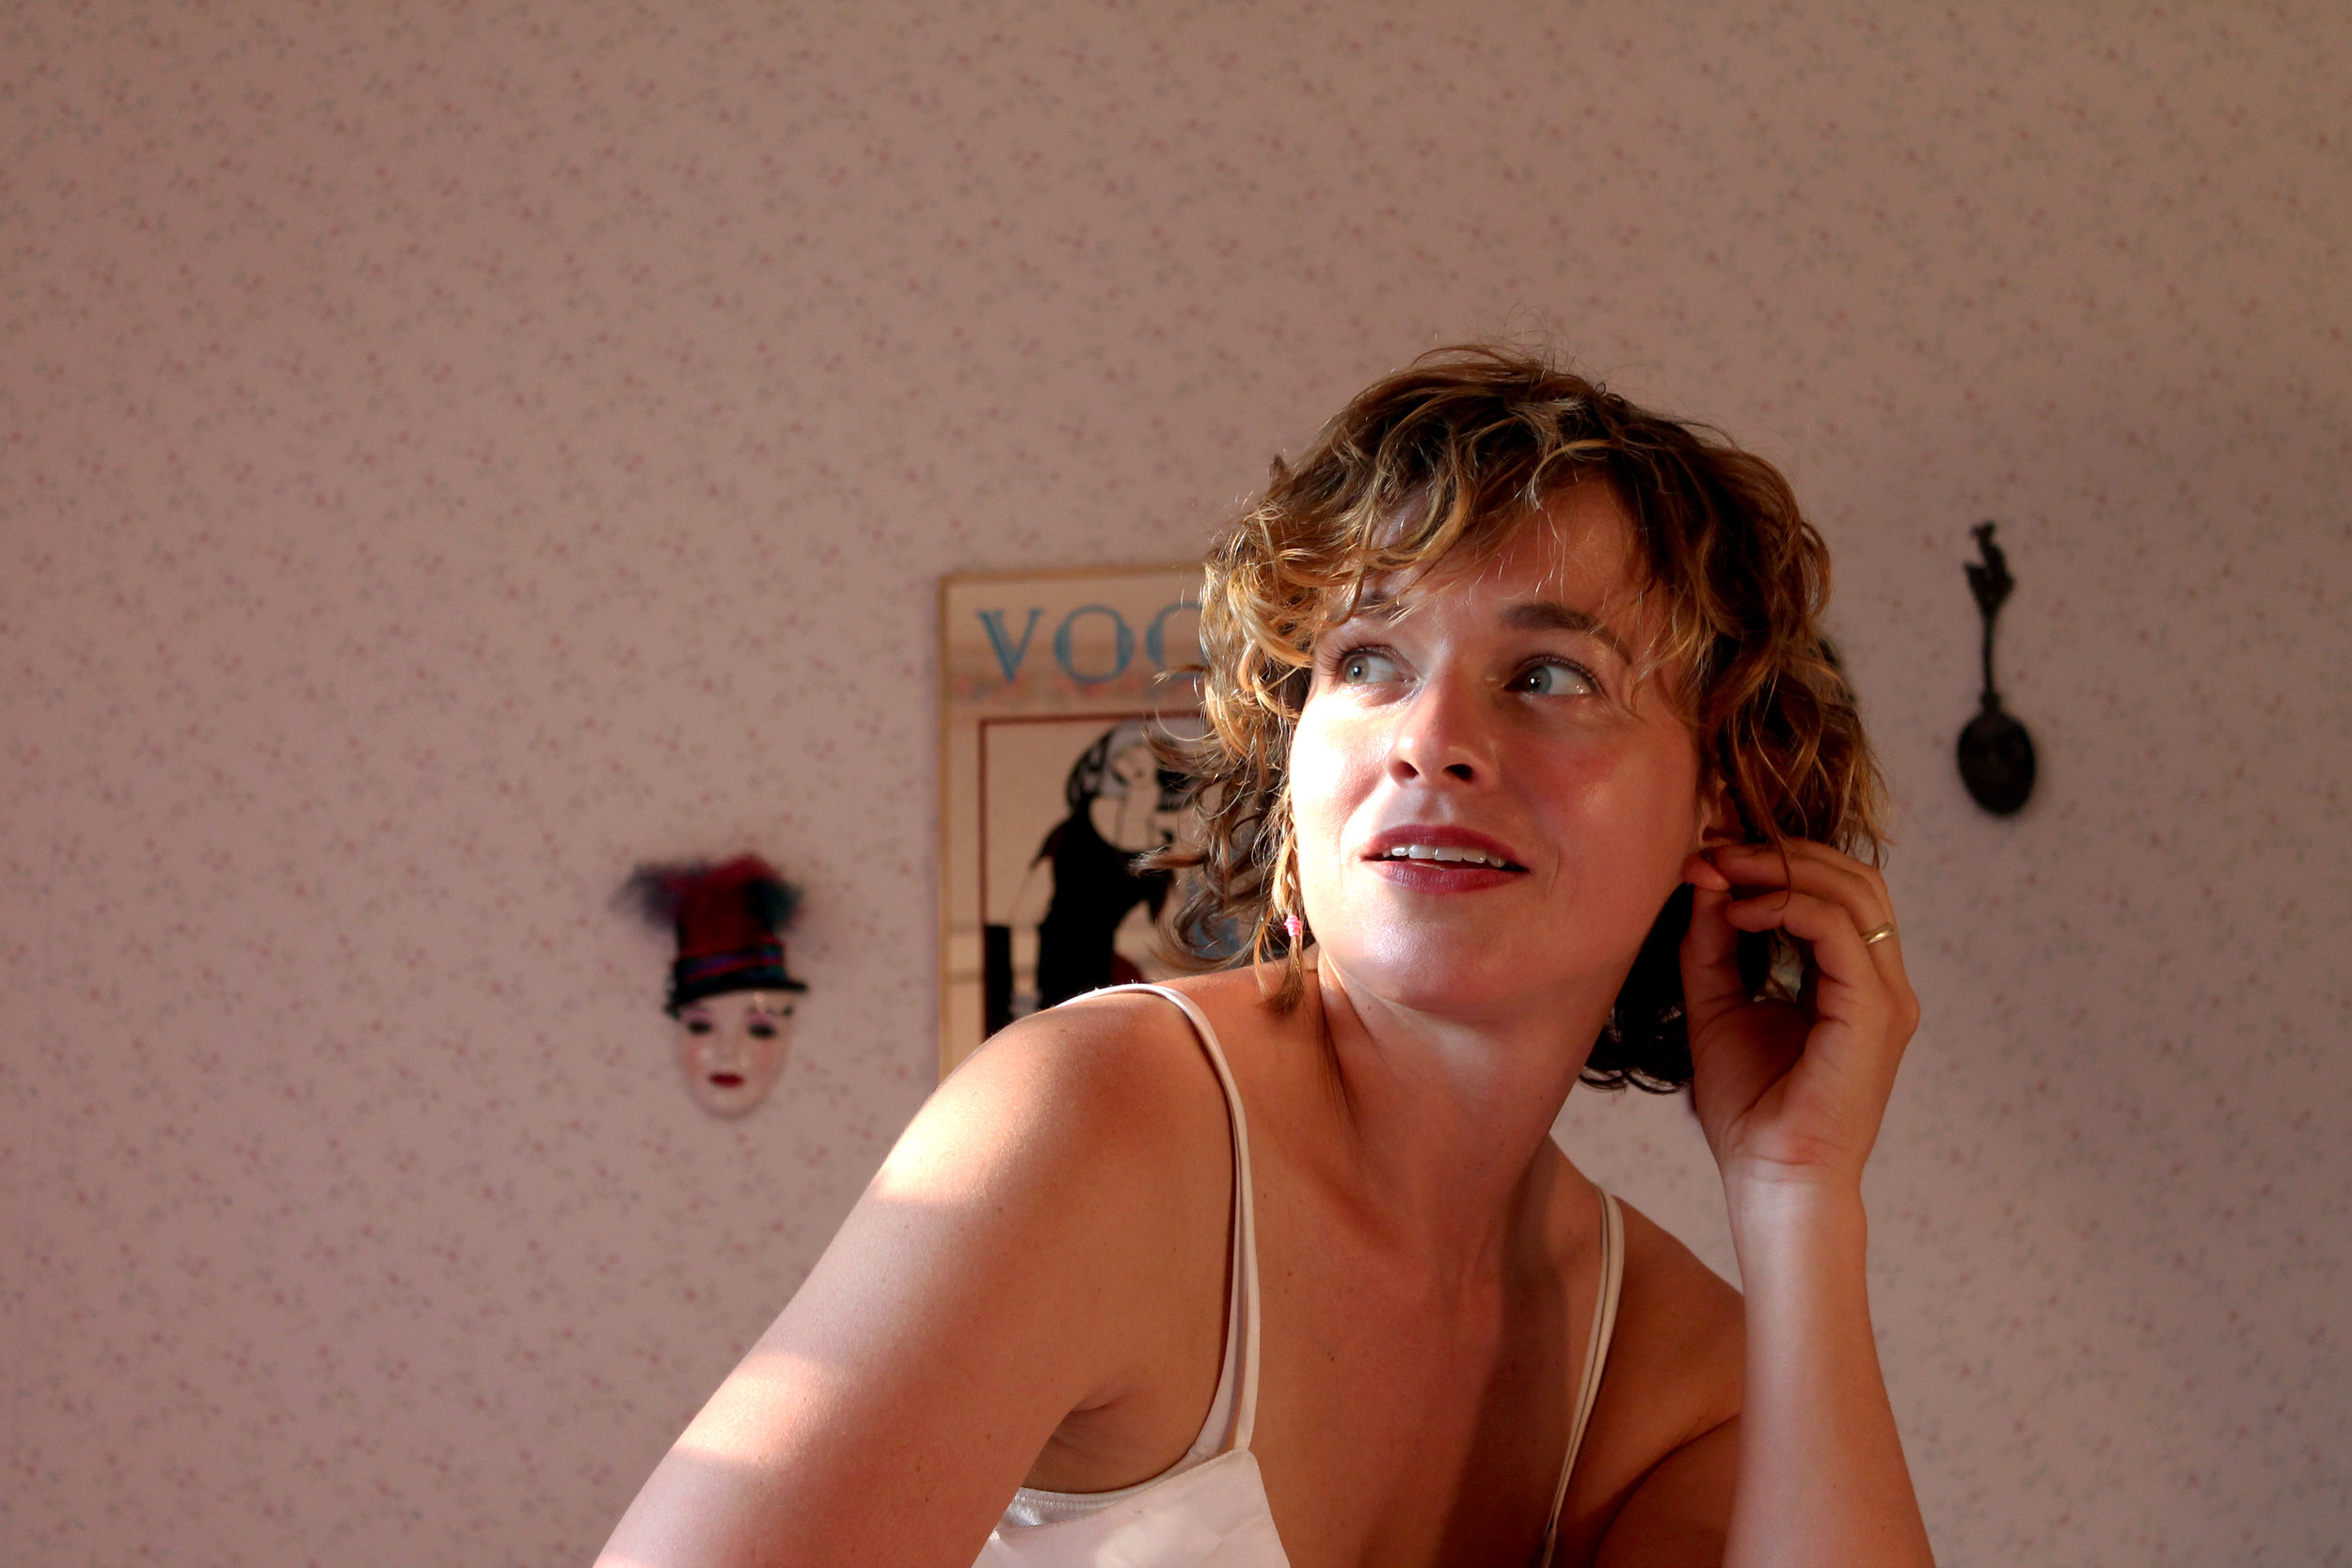 The Leanover by Malaika Astorga